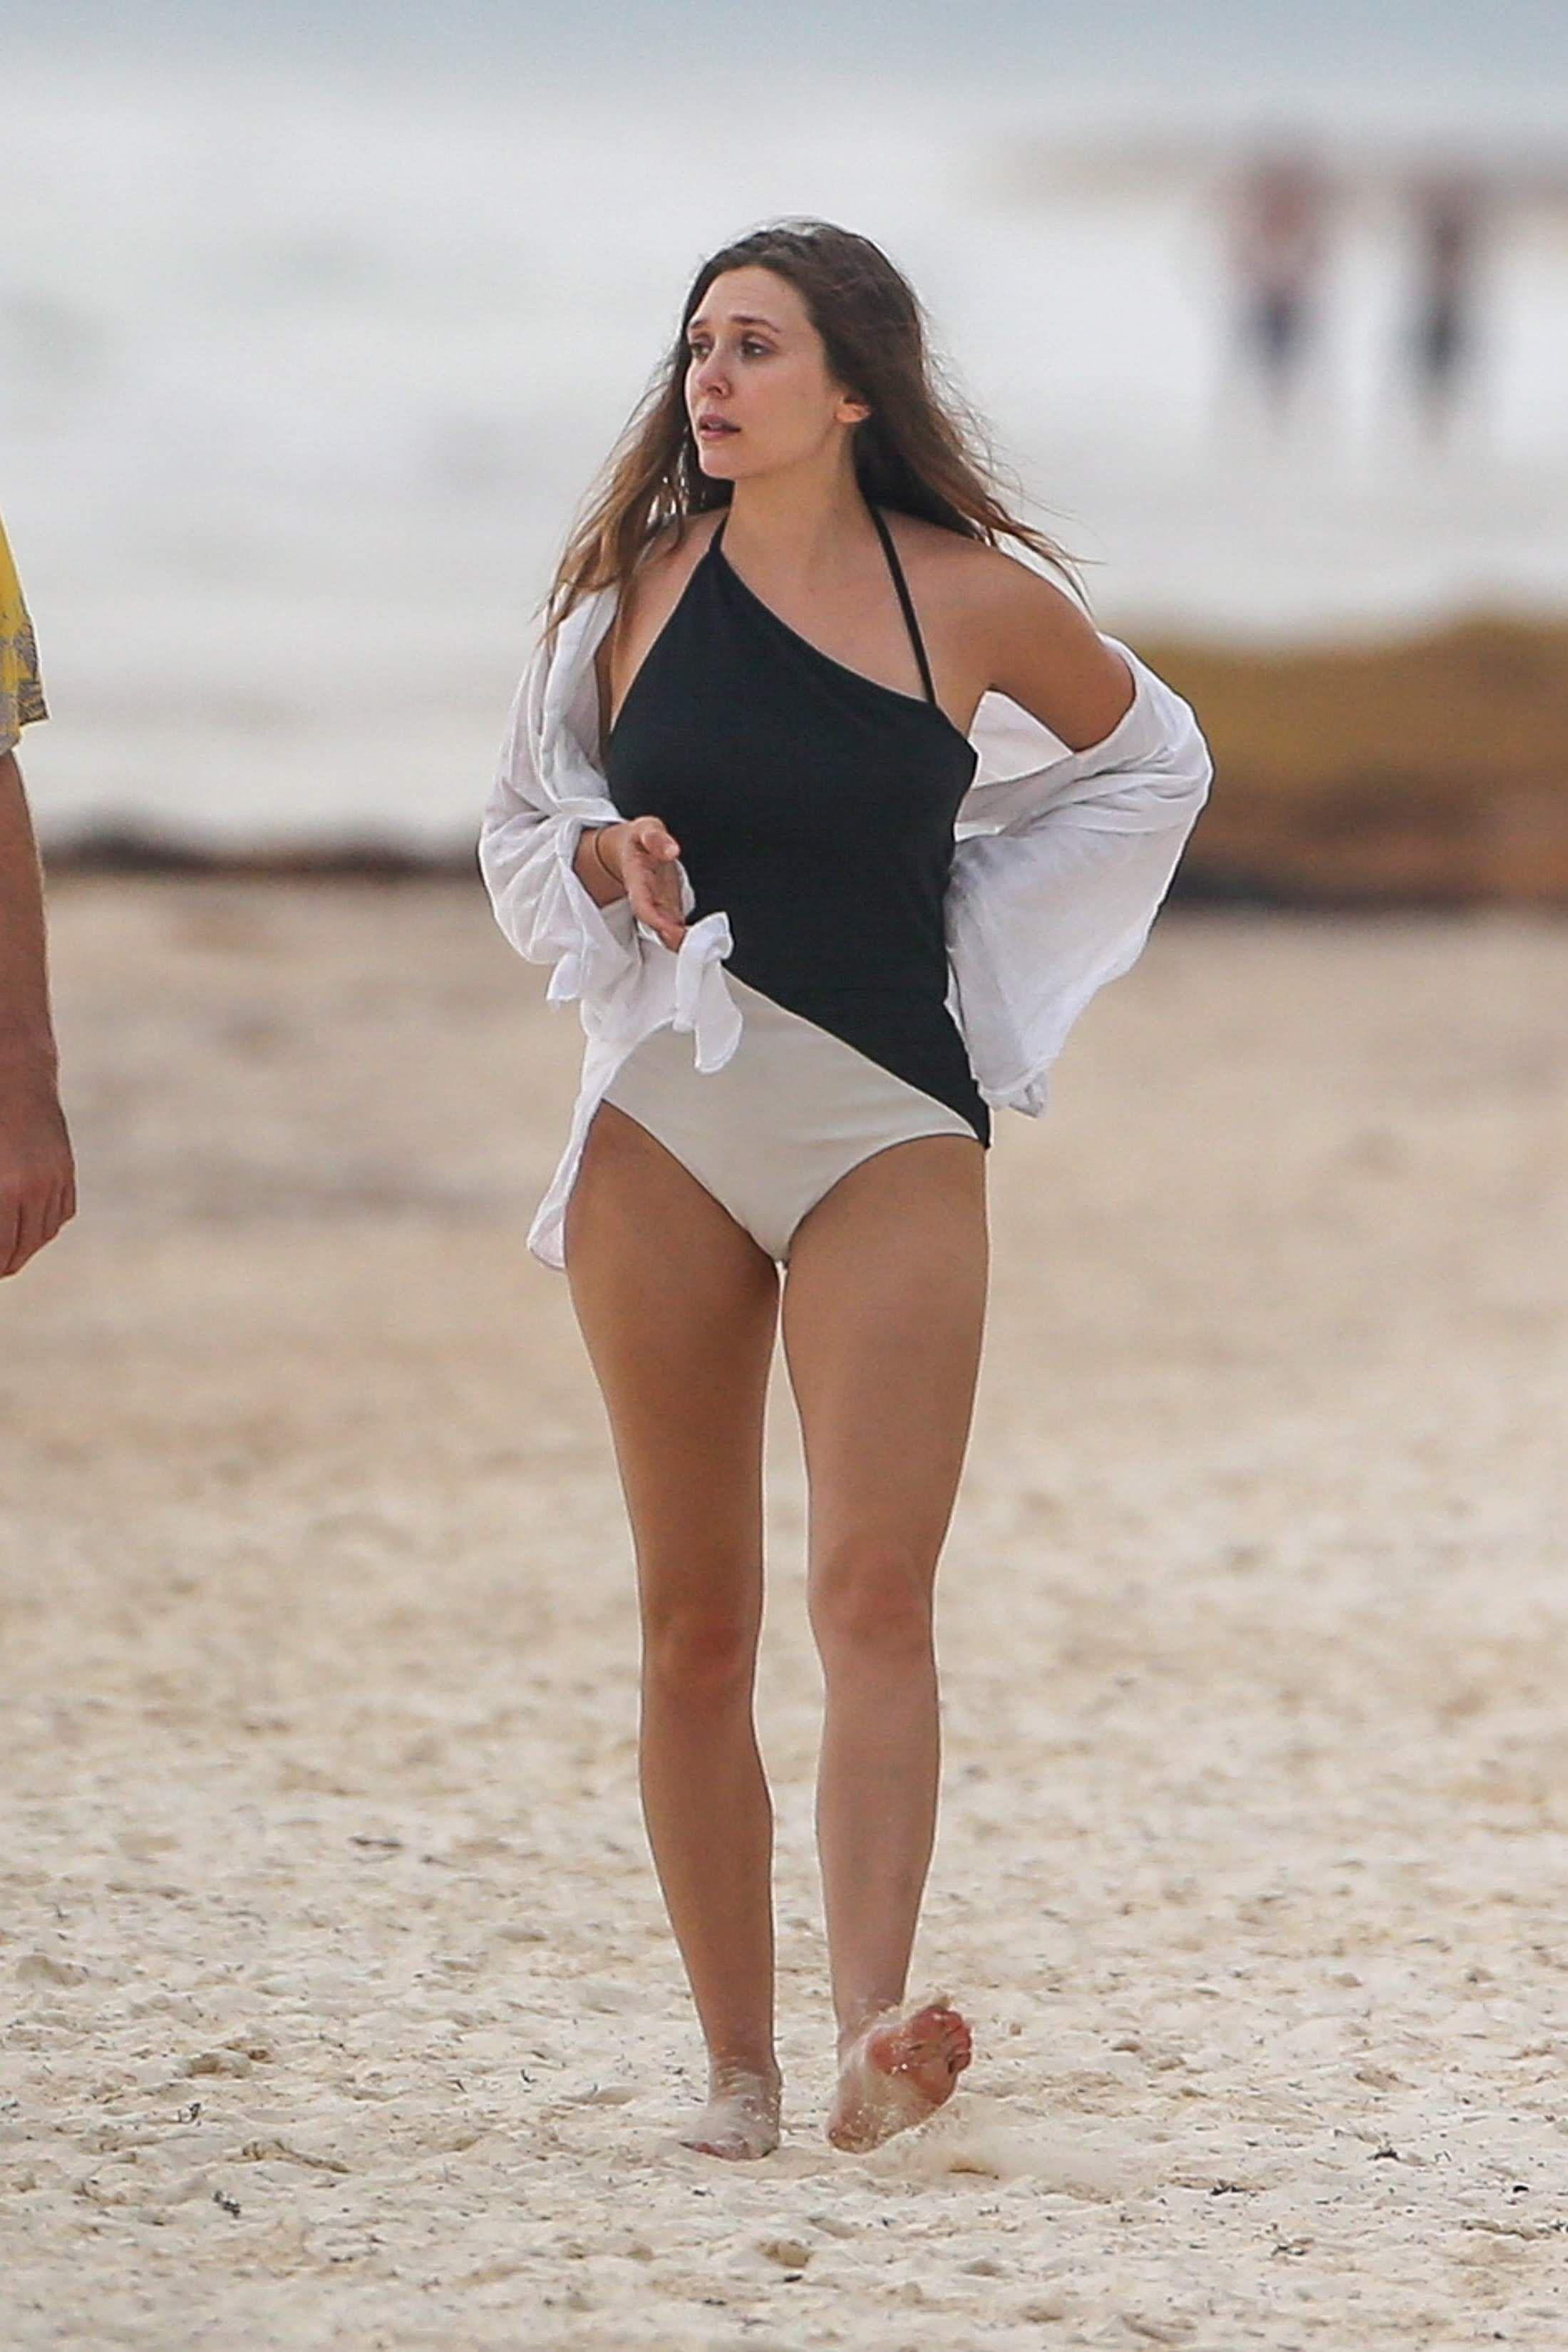 Cleavage Kendal Lee Schuler nudes (78 photo), Tits, Bikini, Feet, underwear 2019